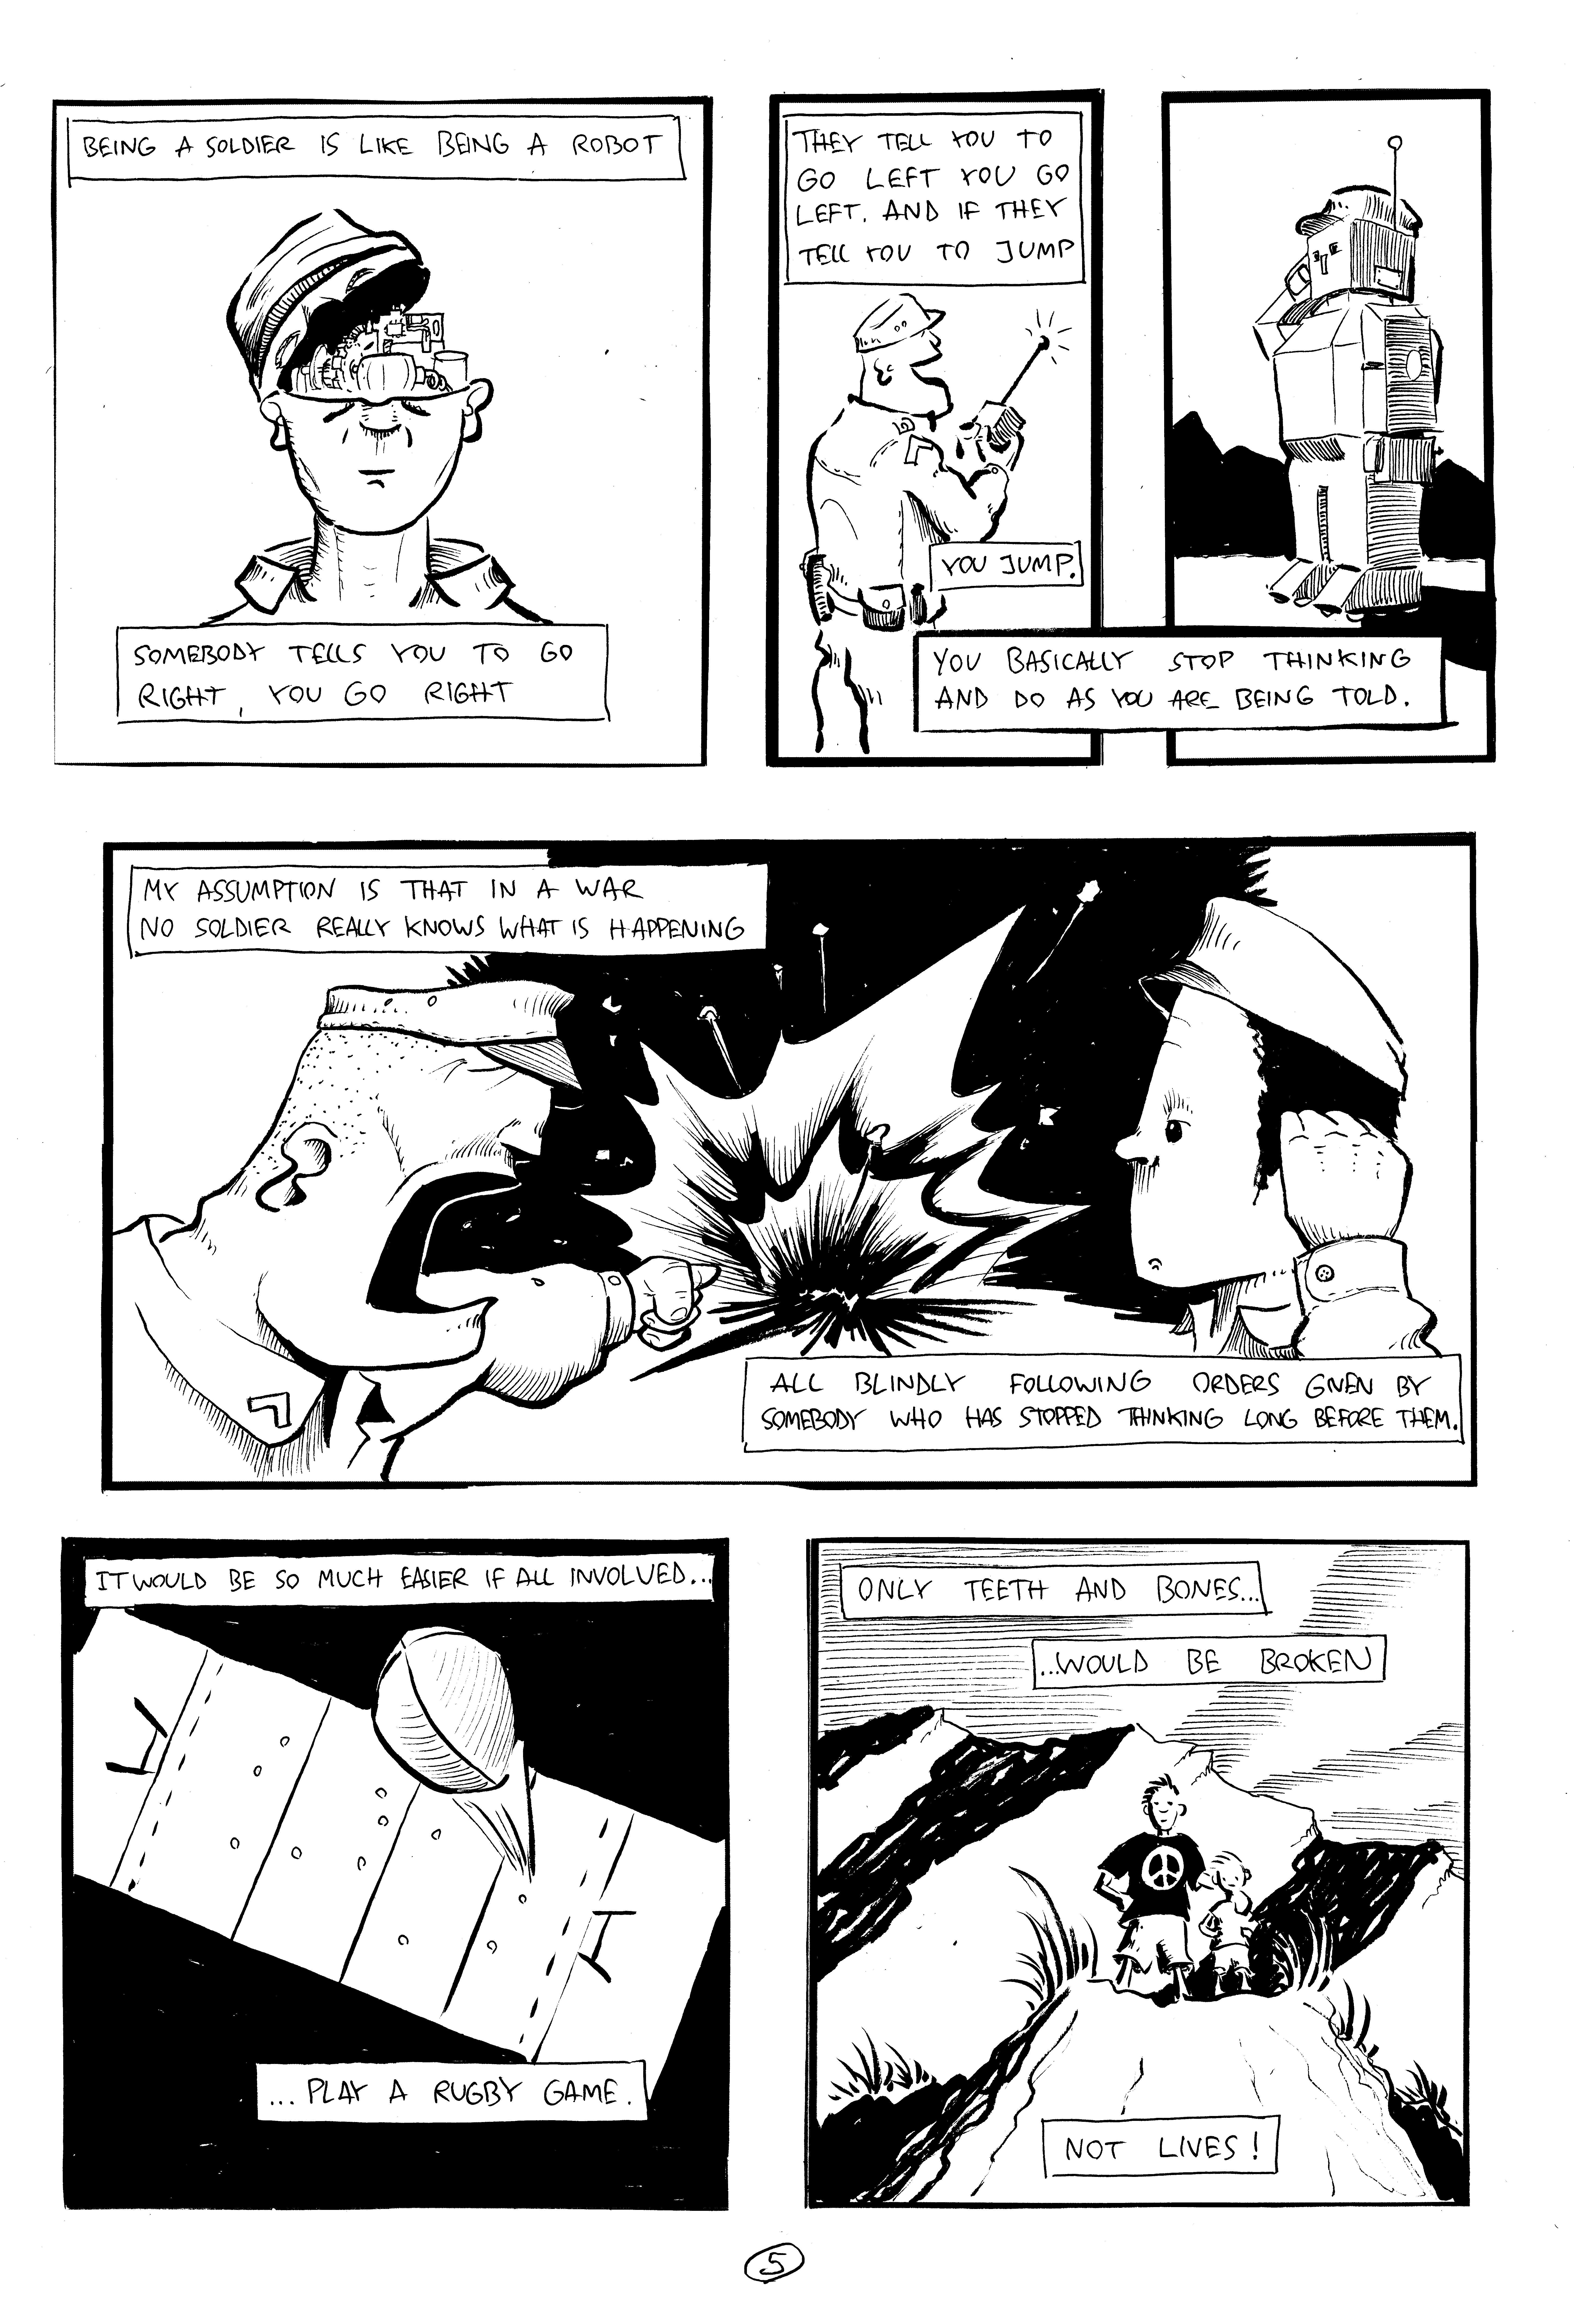 Swiss Army Life - Page 5